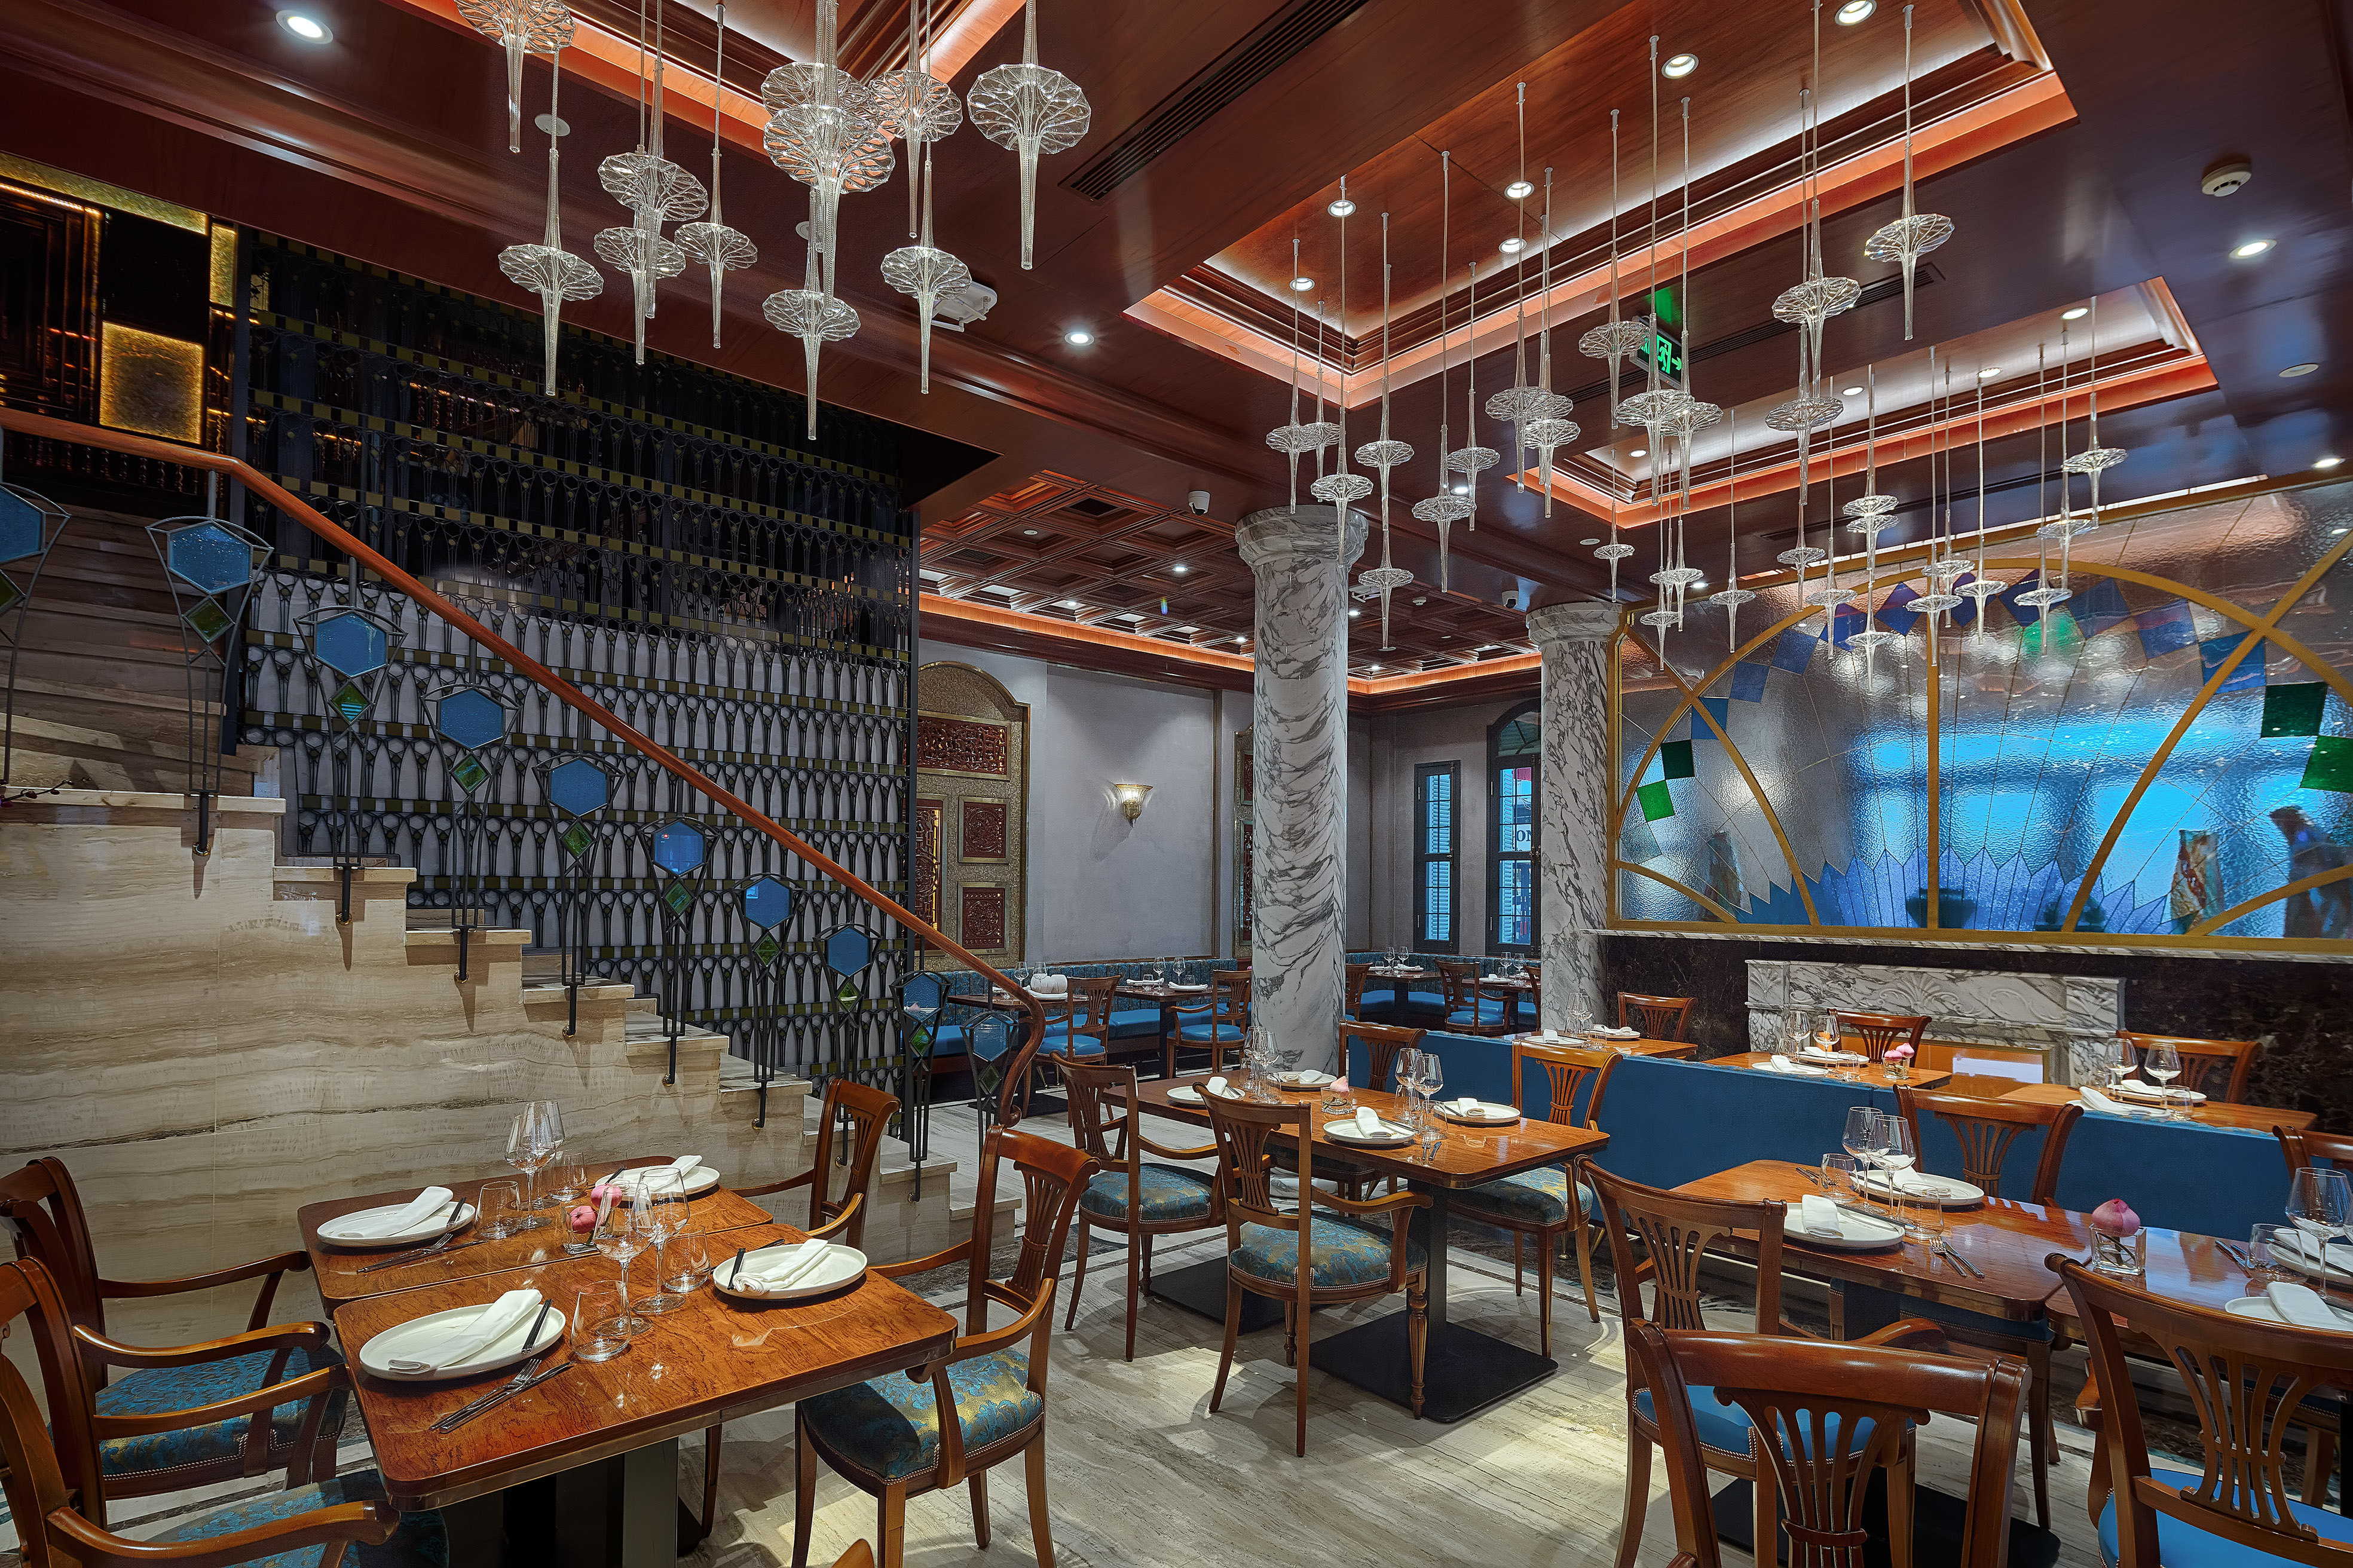 Luke nguyen opens his first restaurant in vietnam west